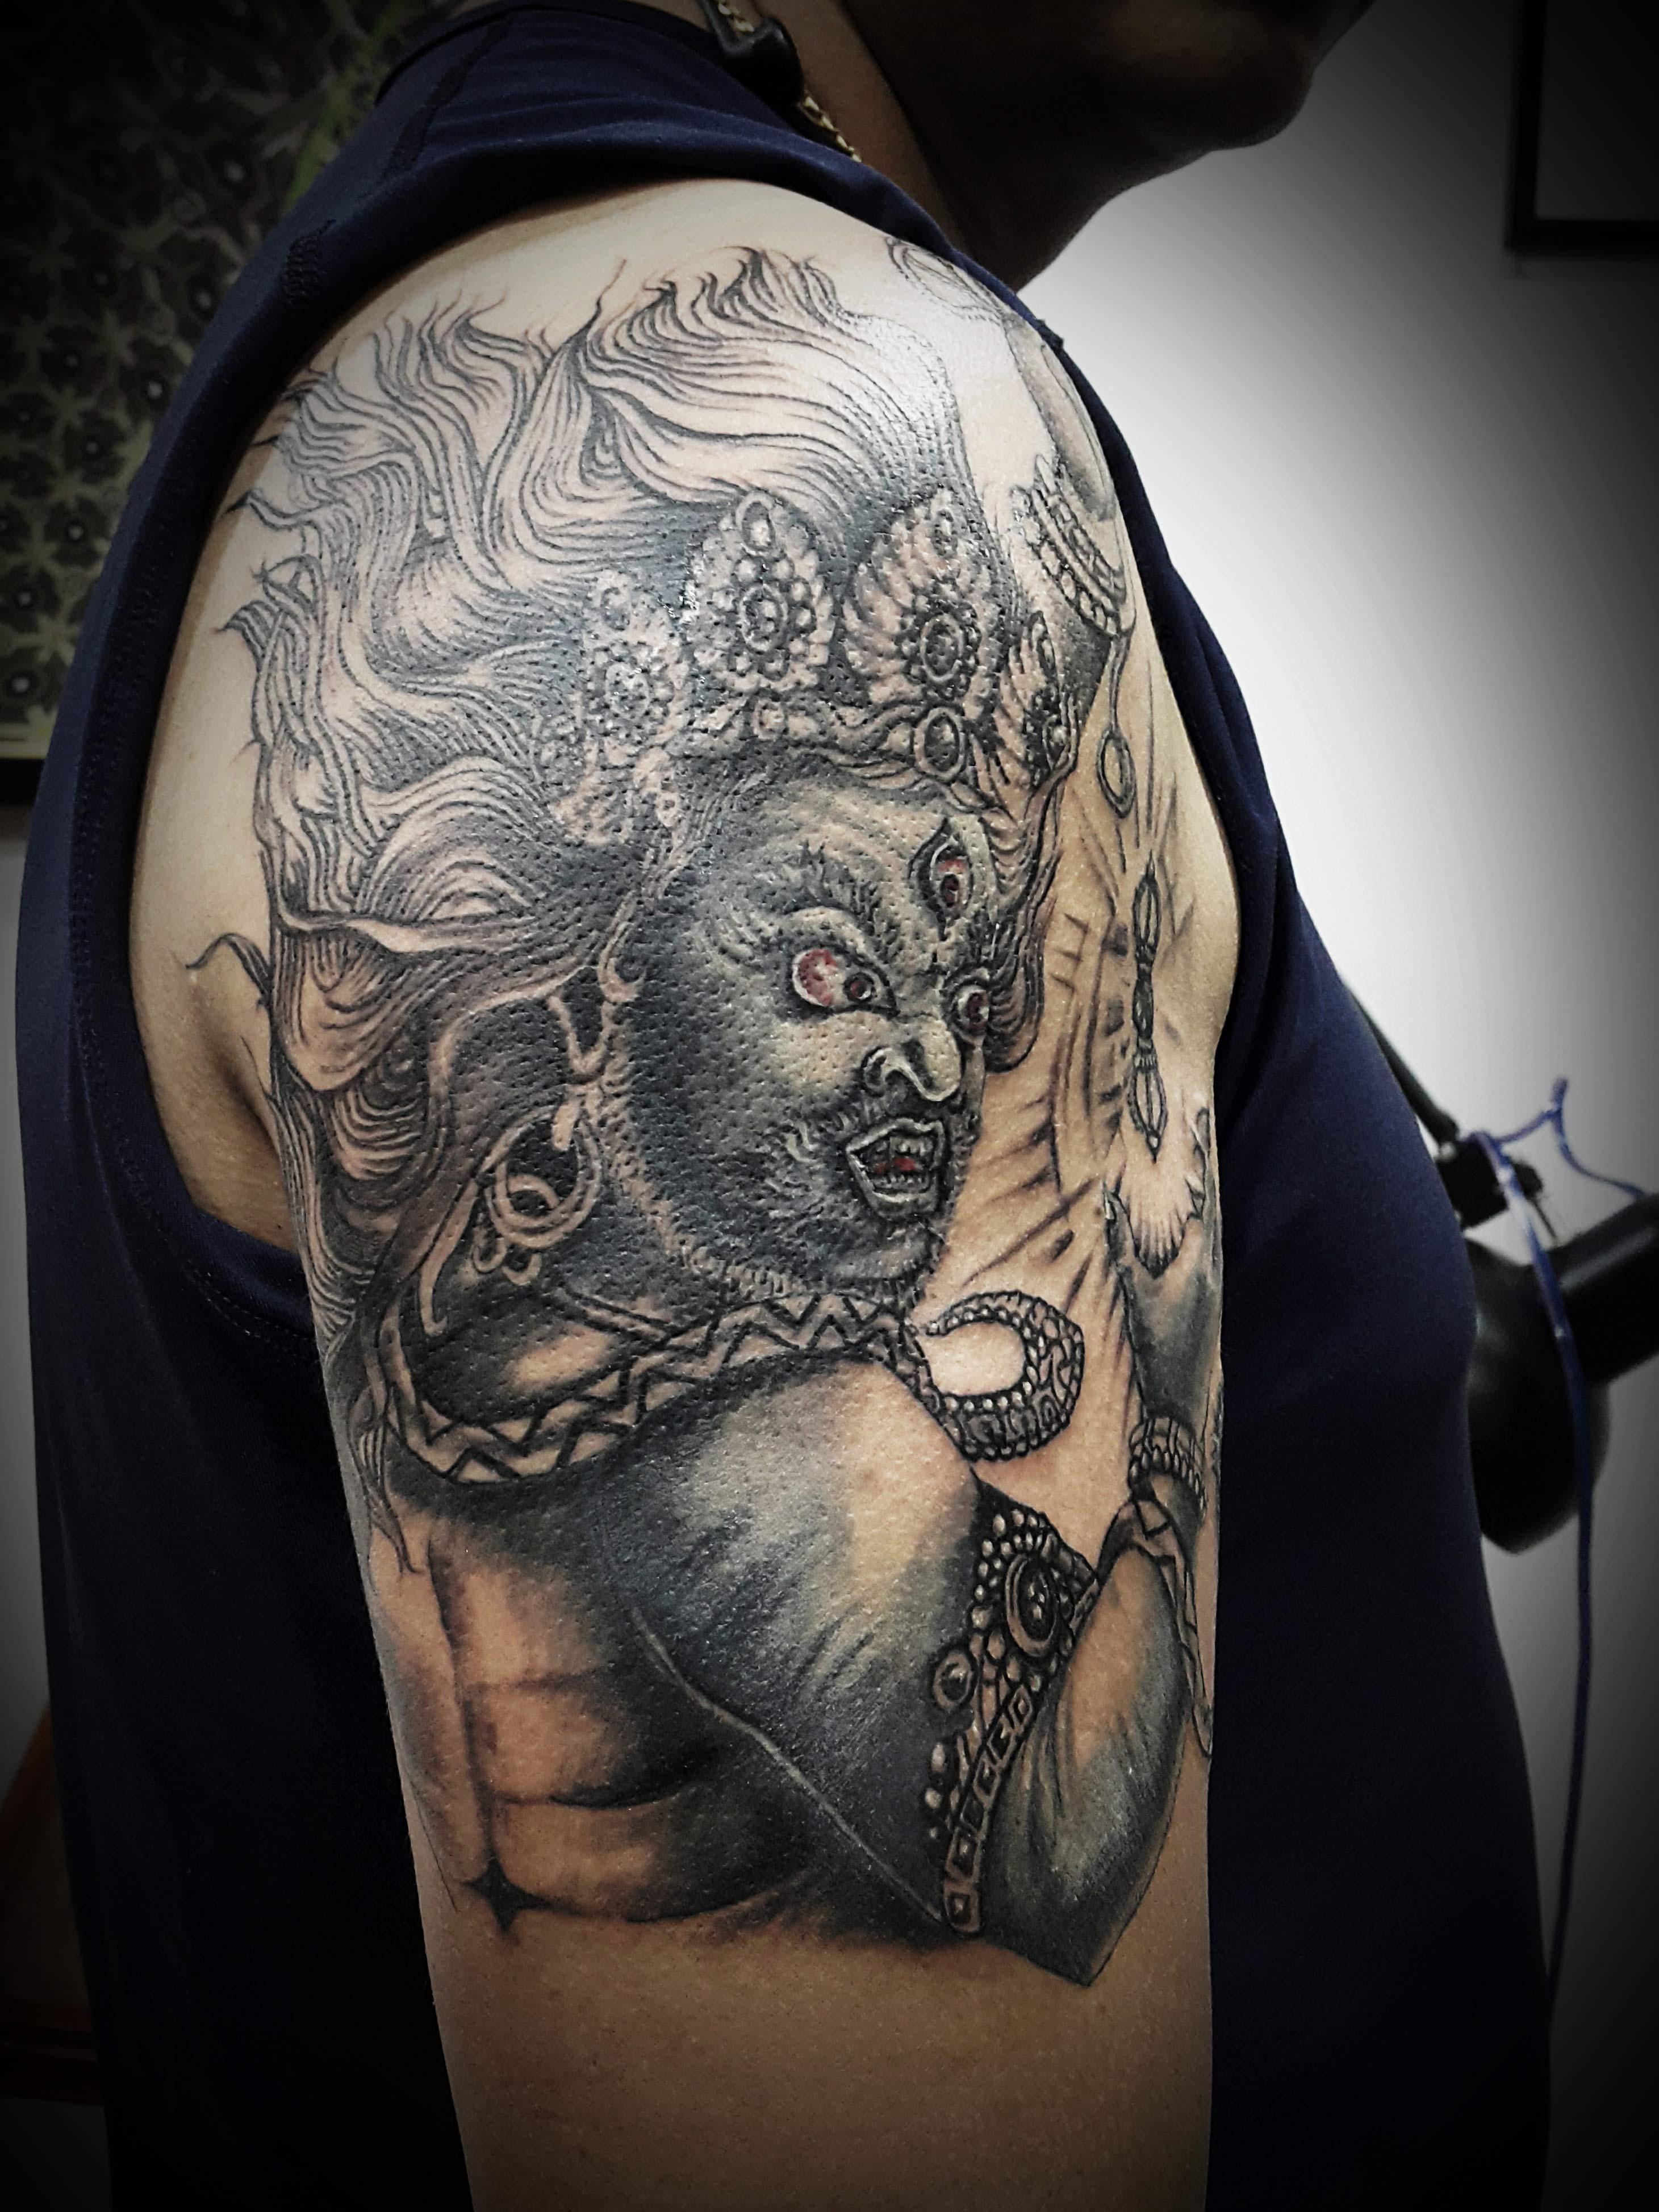 Kaal Bhairav Tattoo, Tattoo Artist in Nepal